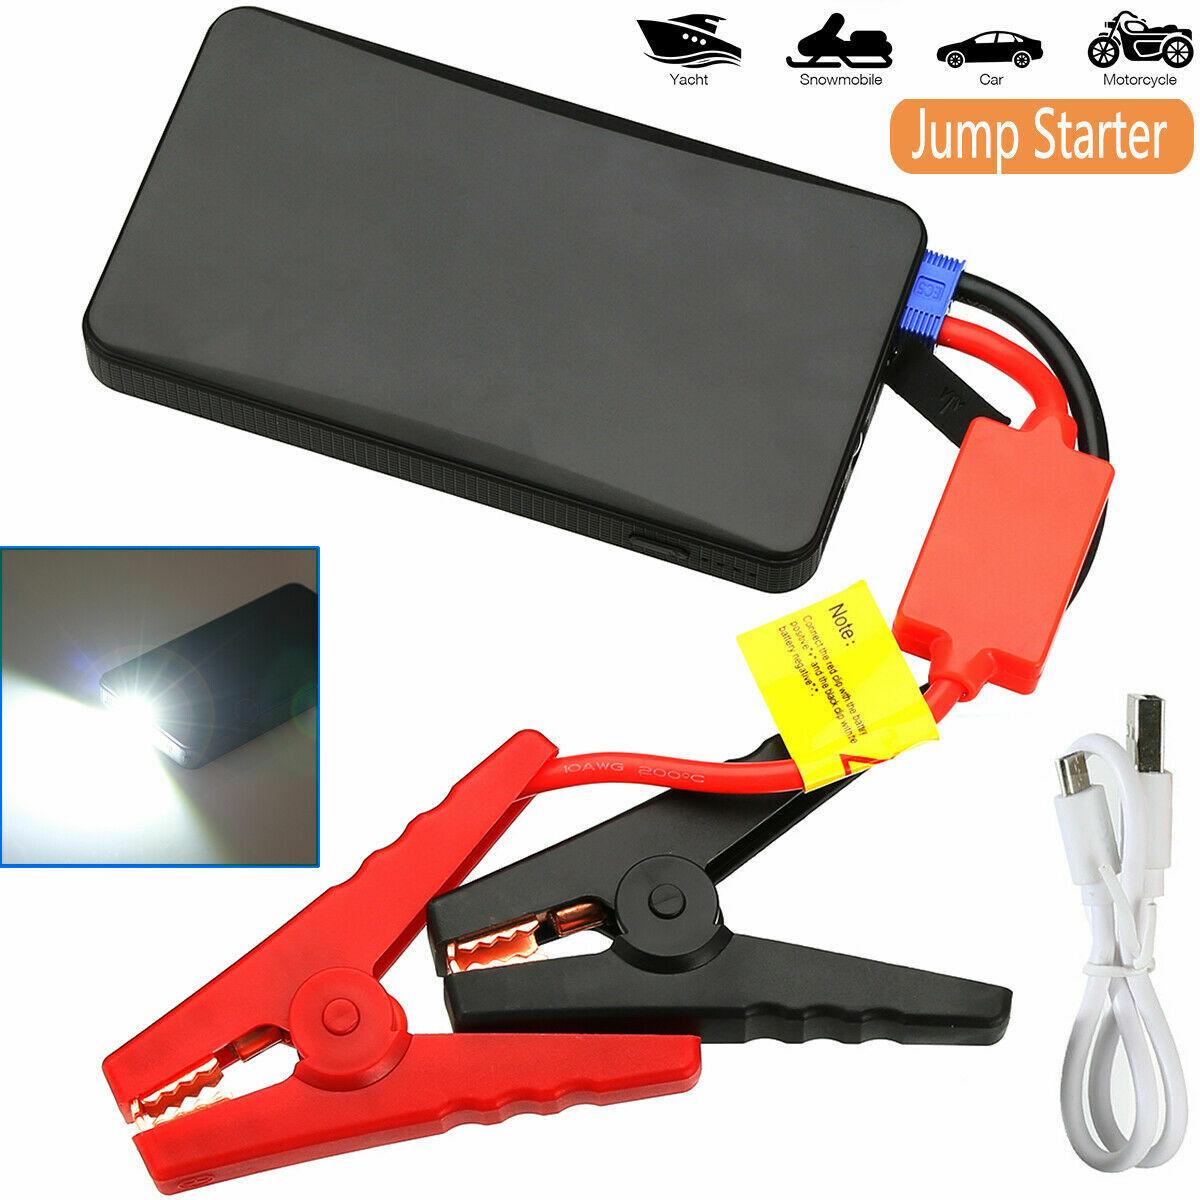 Portable Mini Slim 20000mAh Car Jump Starter Engine Battery Charger Power Bank Automotive Tools & Supplies